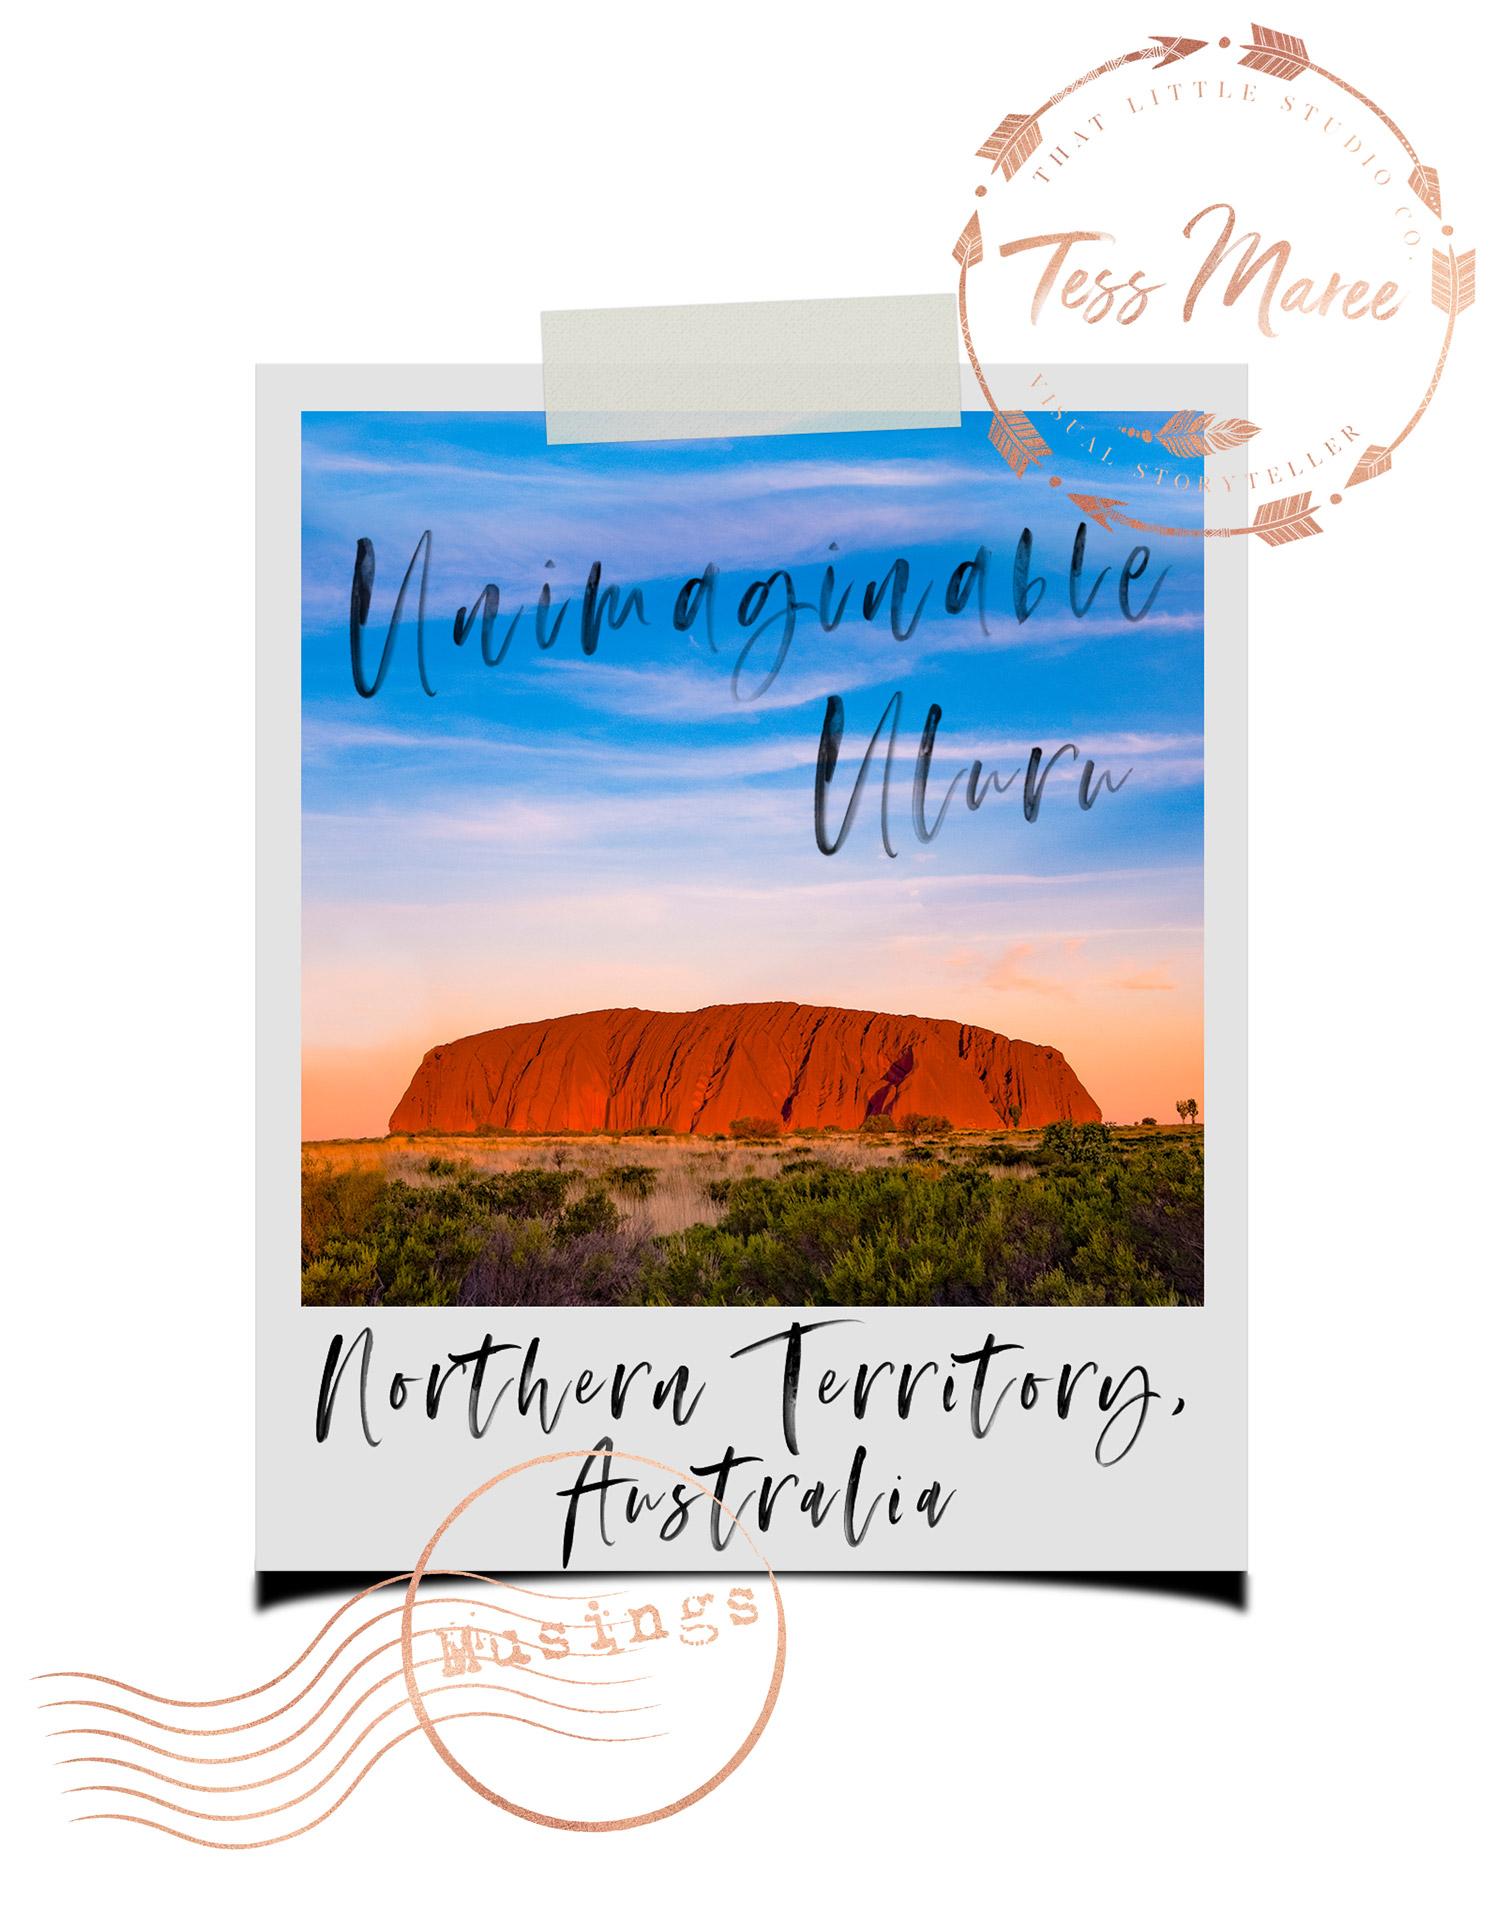 Tess-Maree-Musing-Uluru-Northern-Territory-Australia-Polaroid